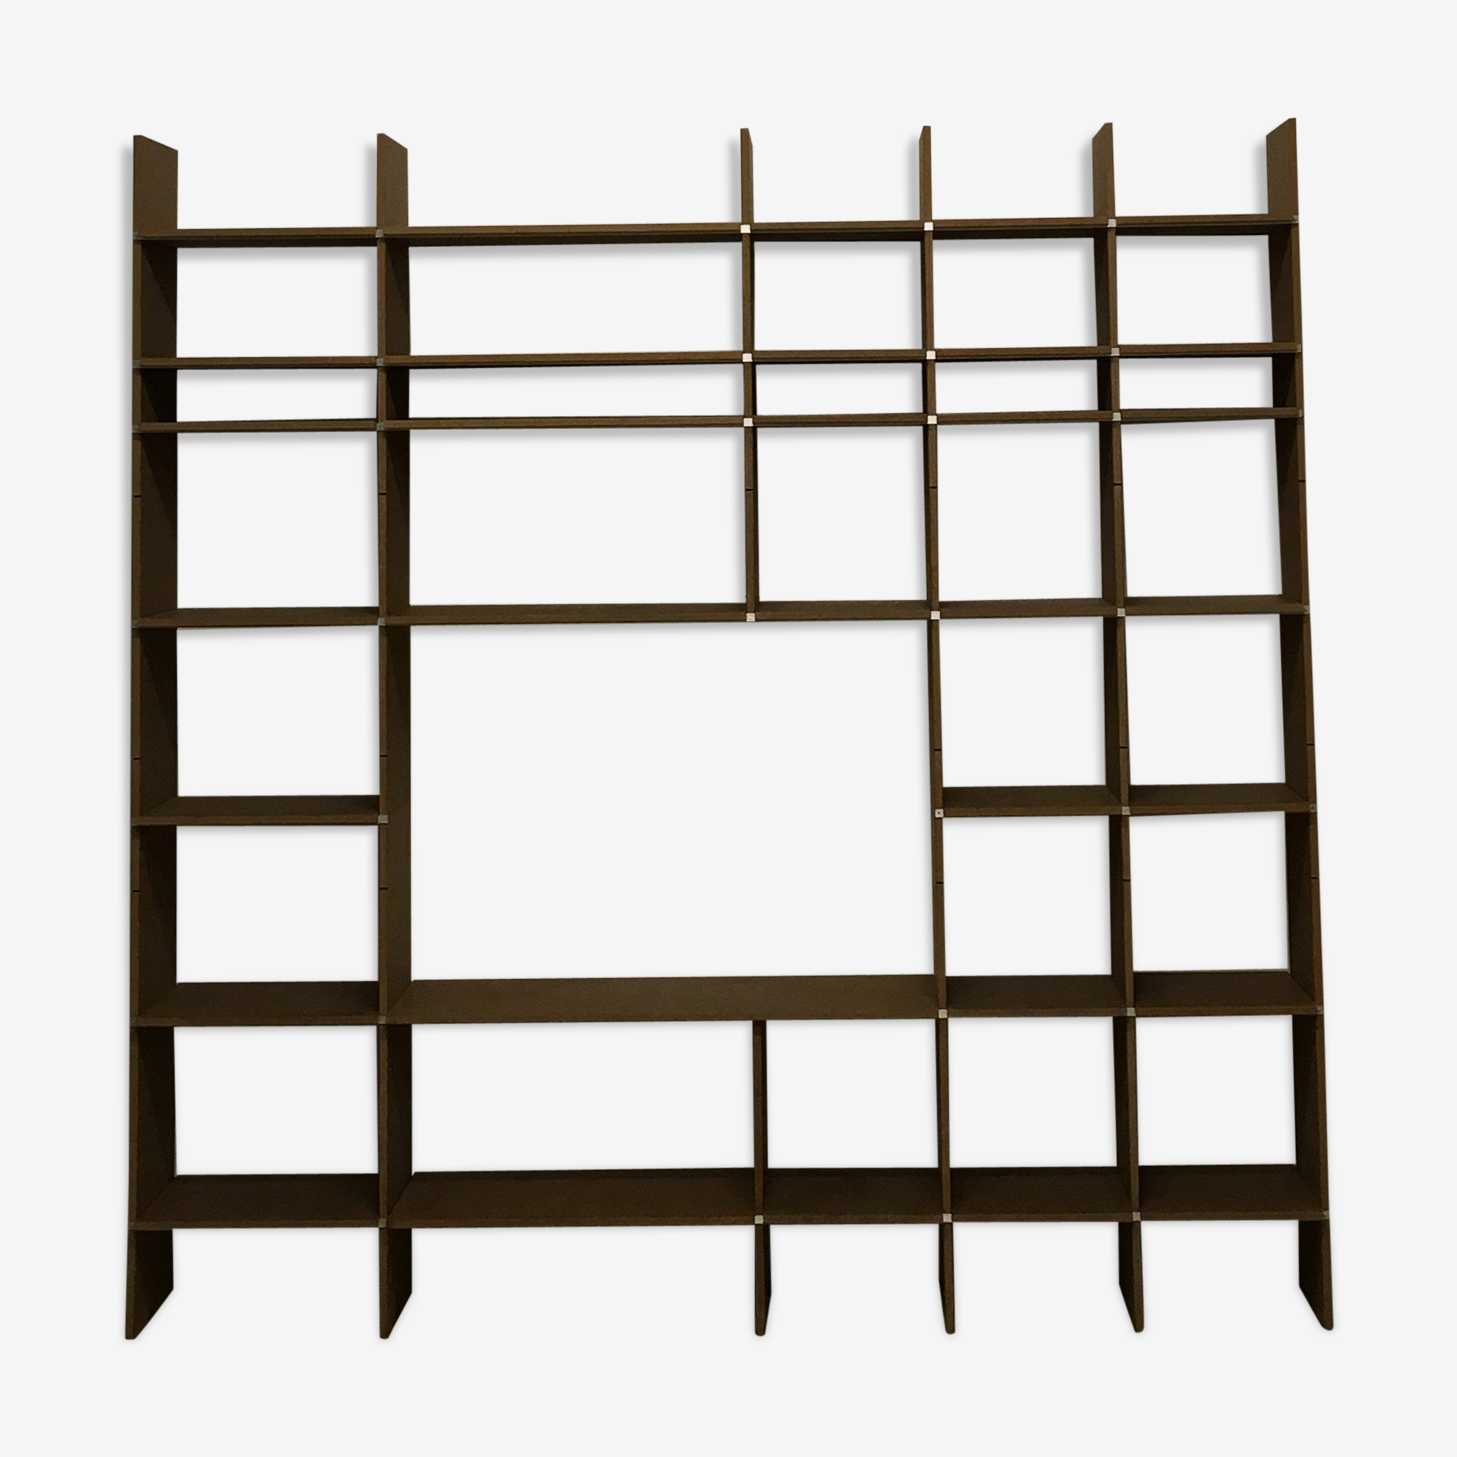 Modular shelf by Axel Kufus Moormann